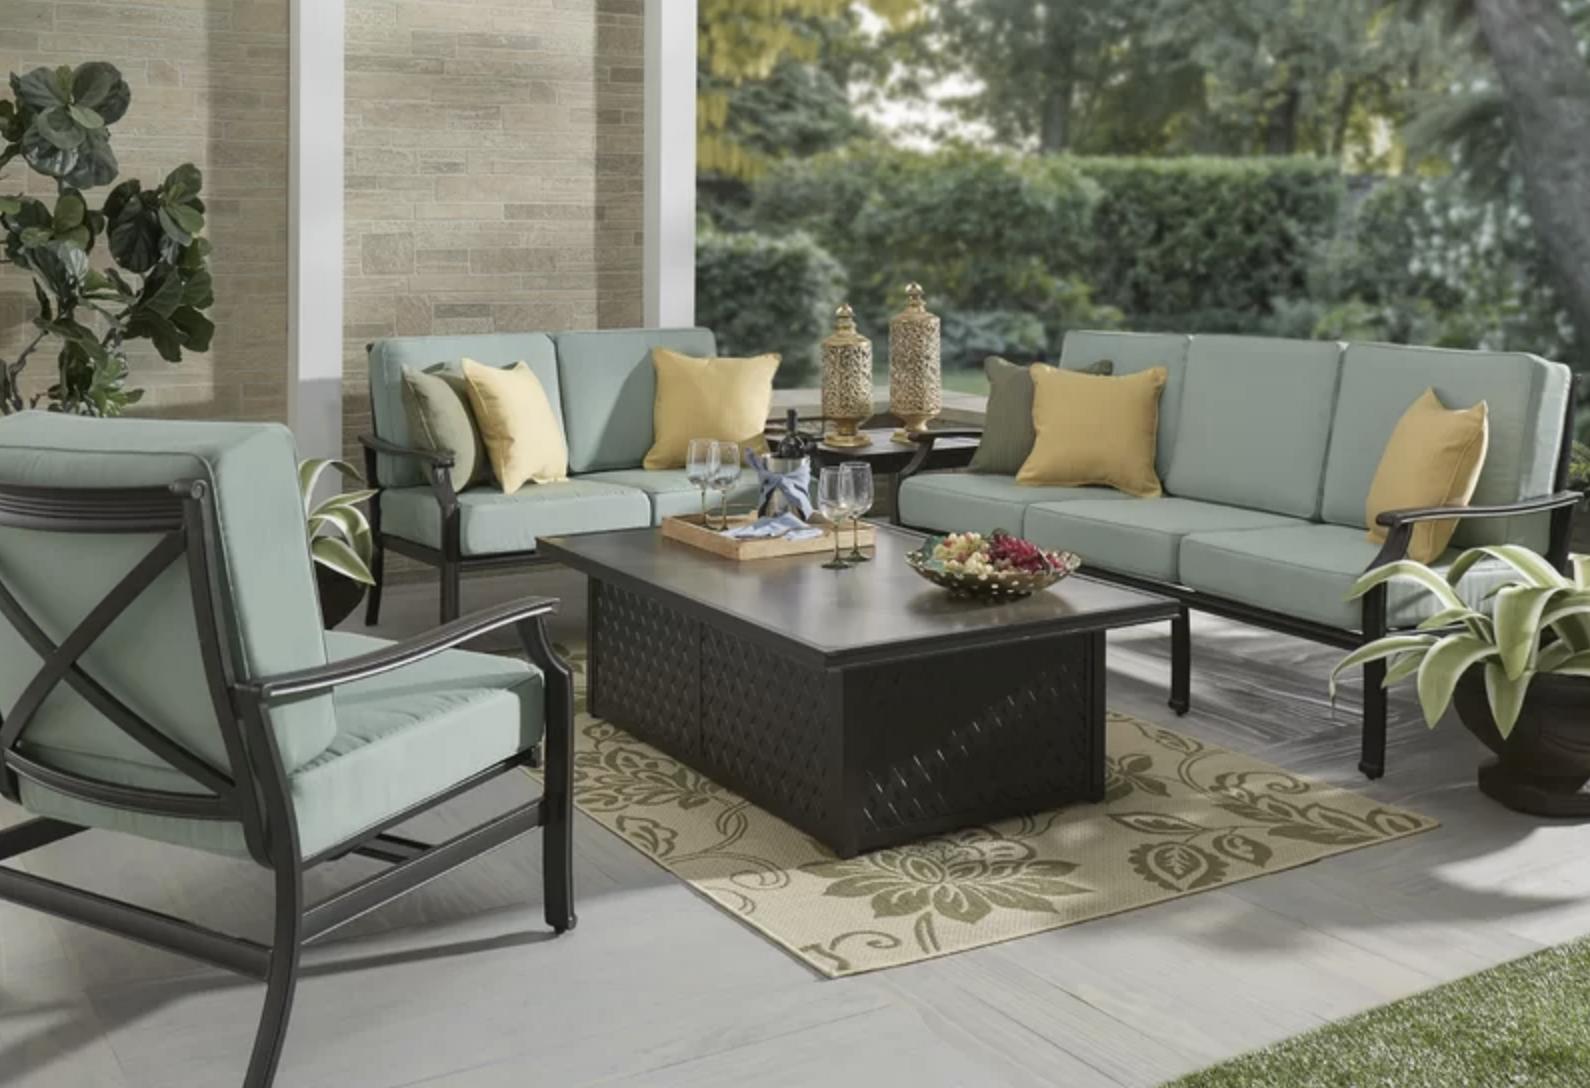 these wayfair patio furniture deals